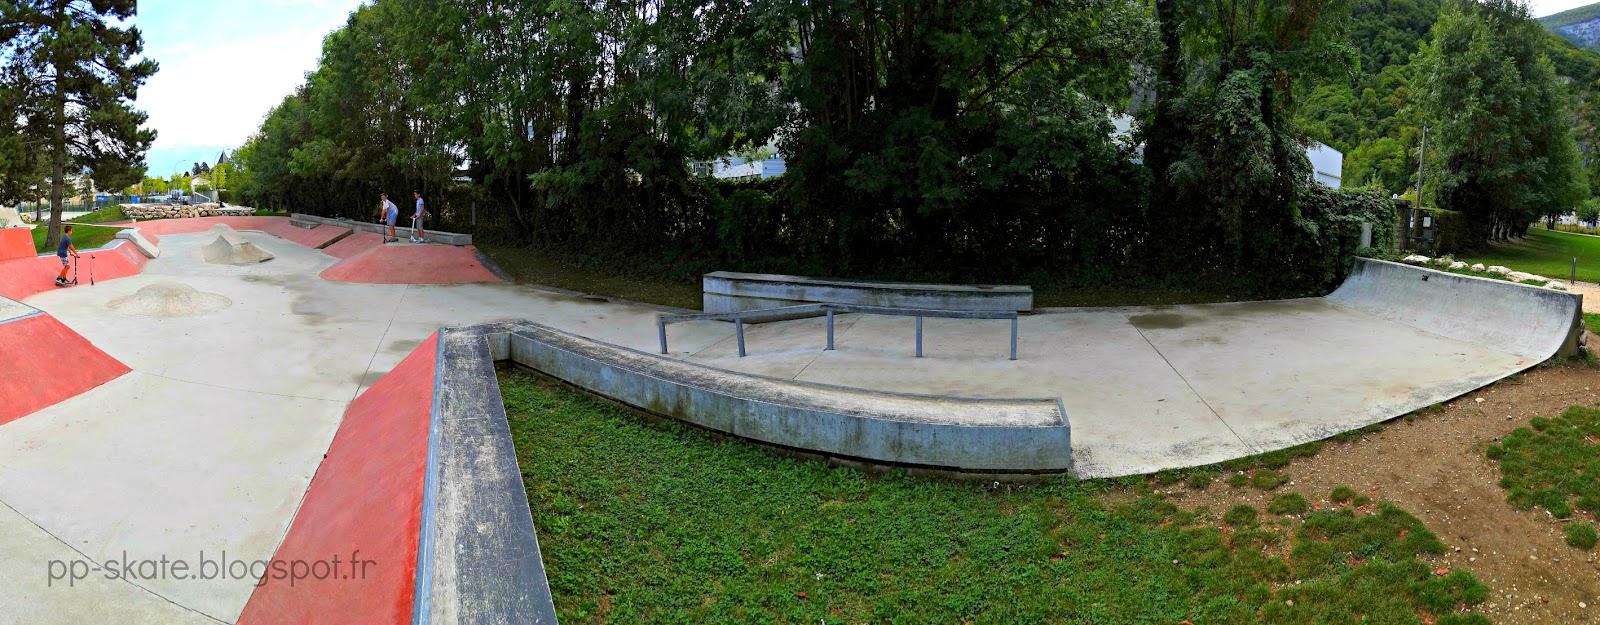 Skate park Fontaine